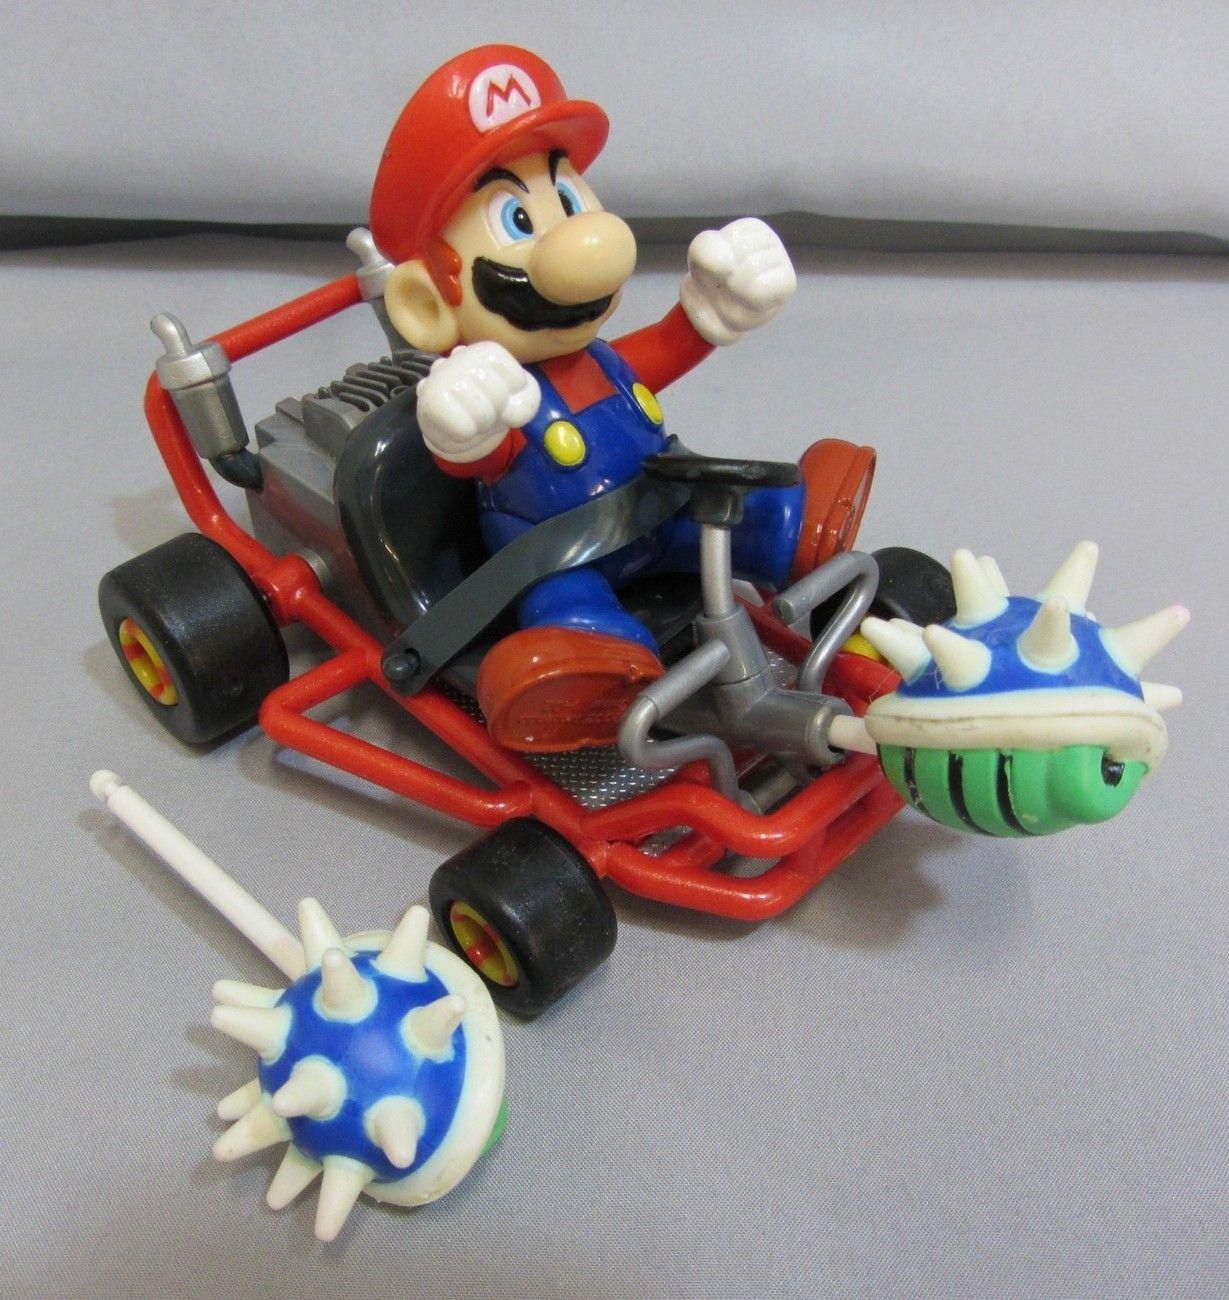 Bonanza Find Everything But The Ordinary Video Games Nintendo Kids Toys Mario Kart 64